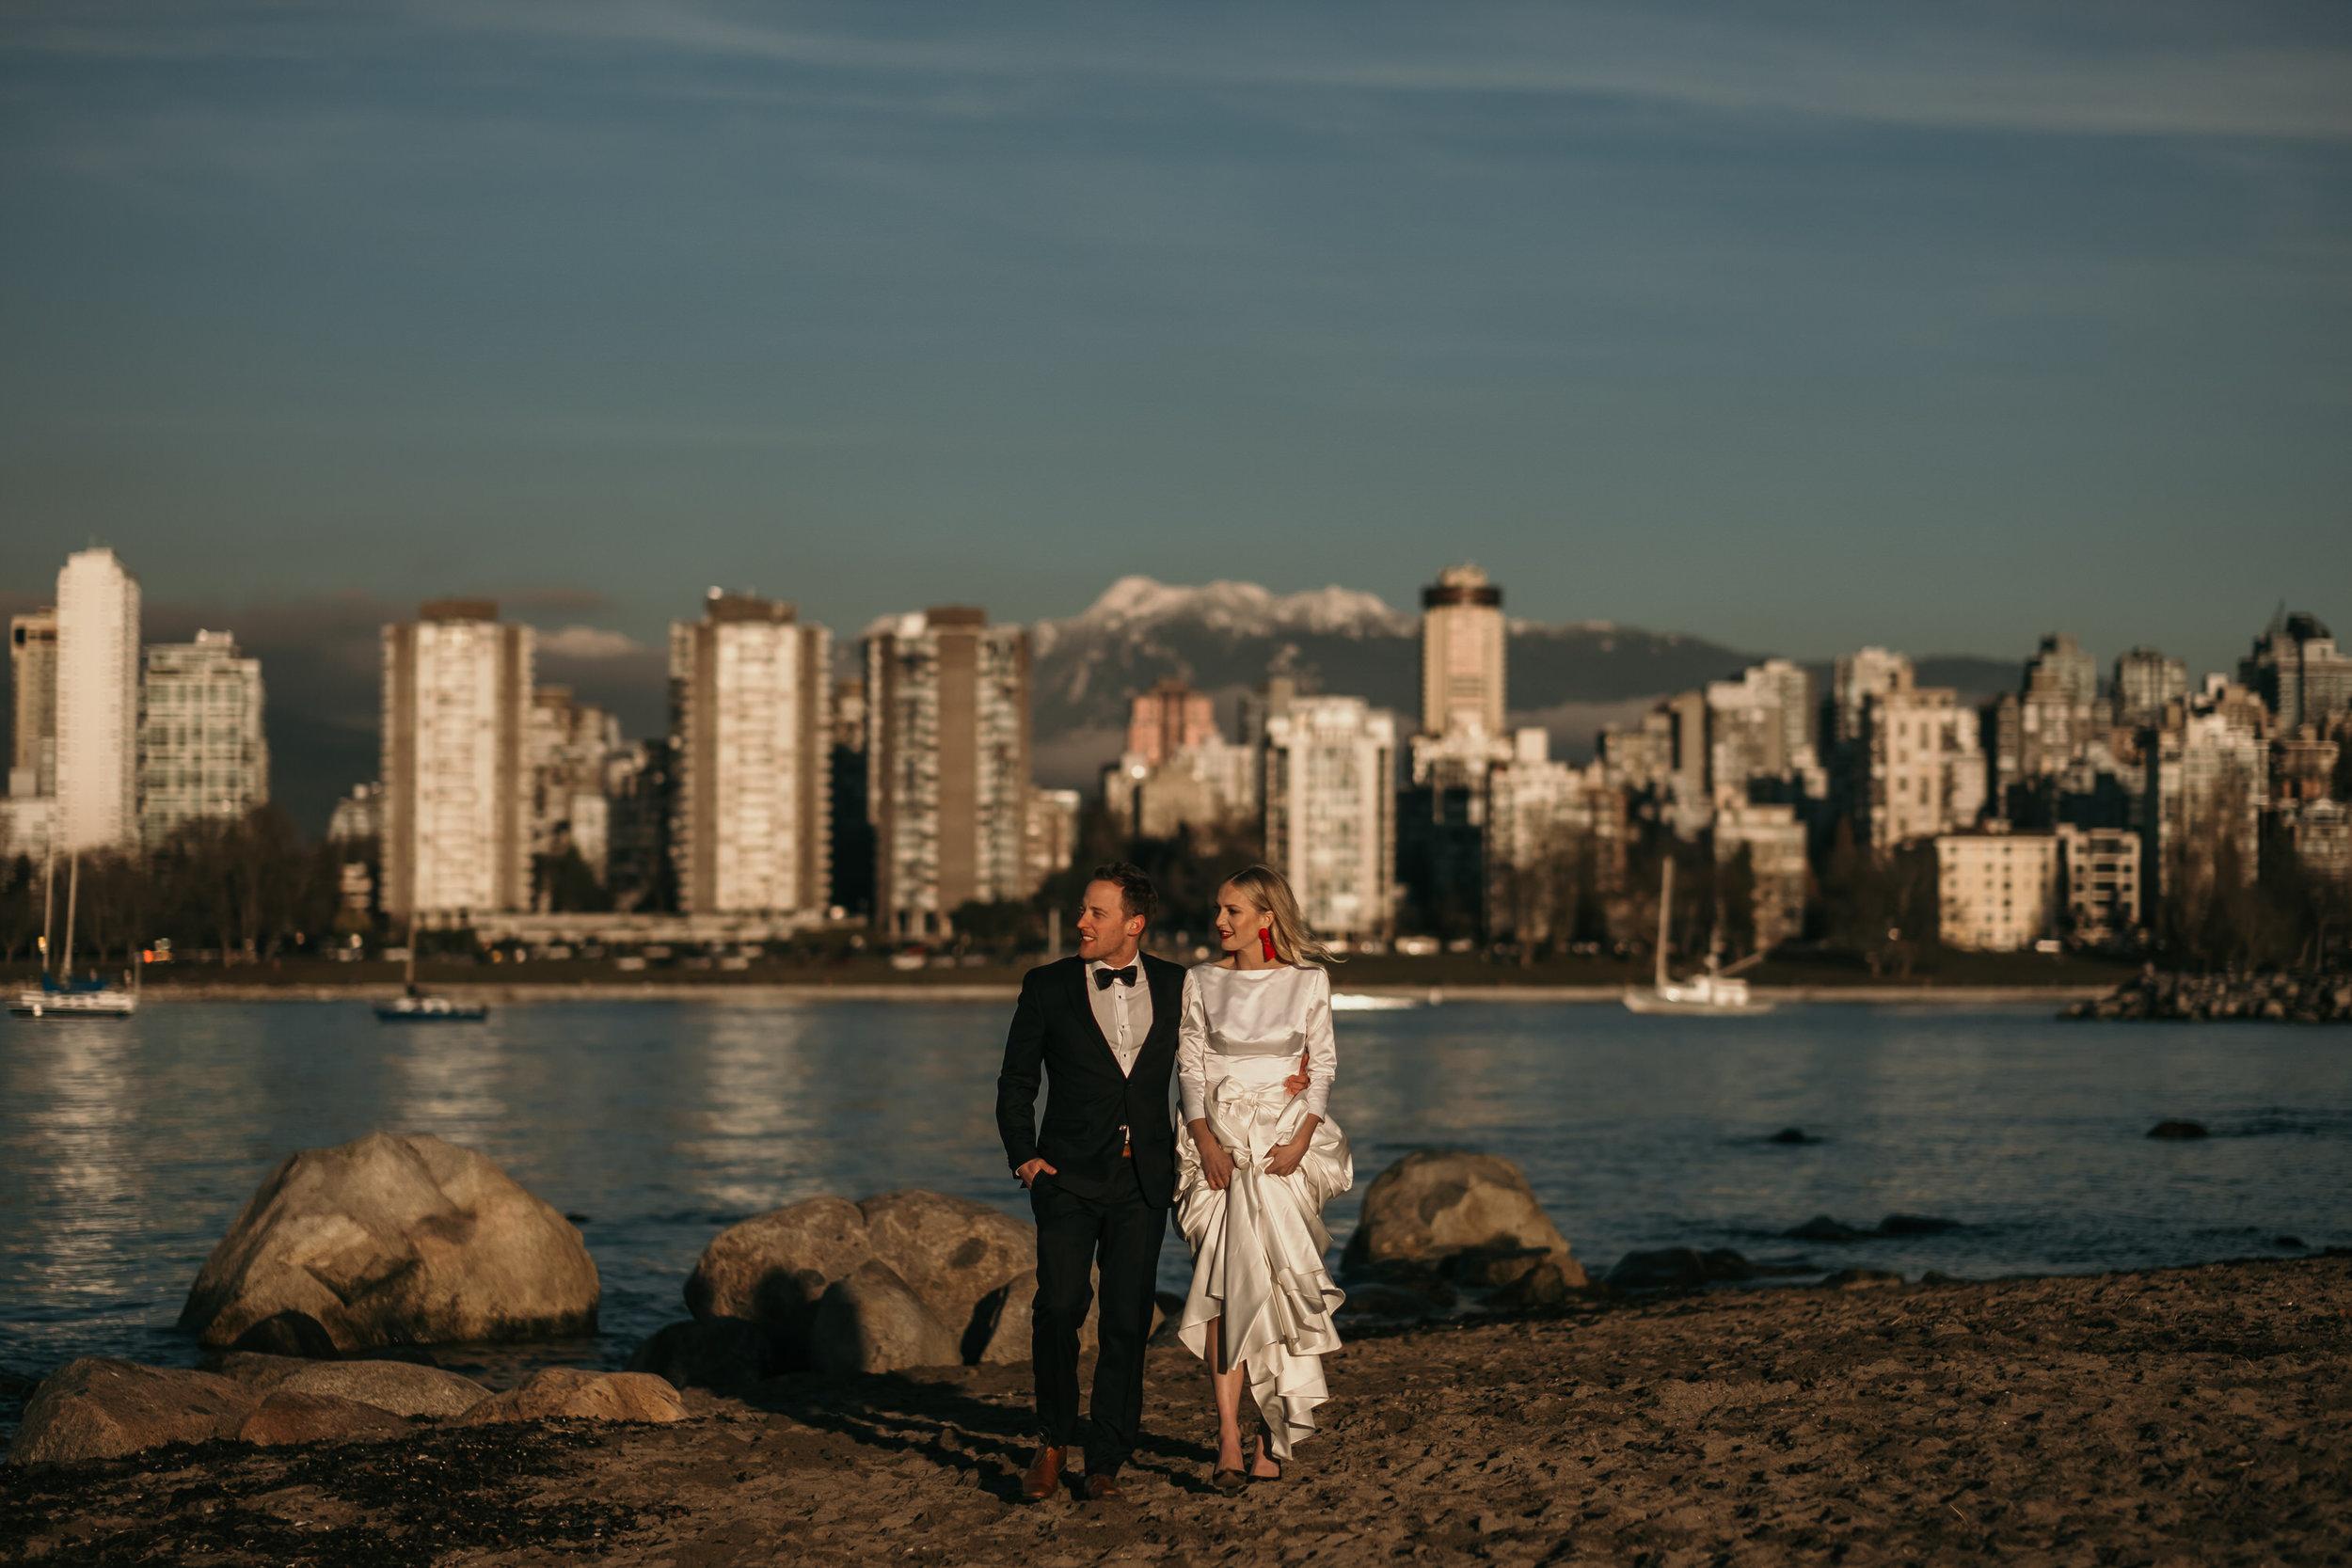 Vancouver Wedding Photos - Vegan Wedding Photographer - New Years Eve Wedding Photos - Vancouver Wedding Photographer - Vancouver Wedding Videographer - 746.JPG